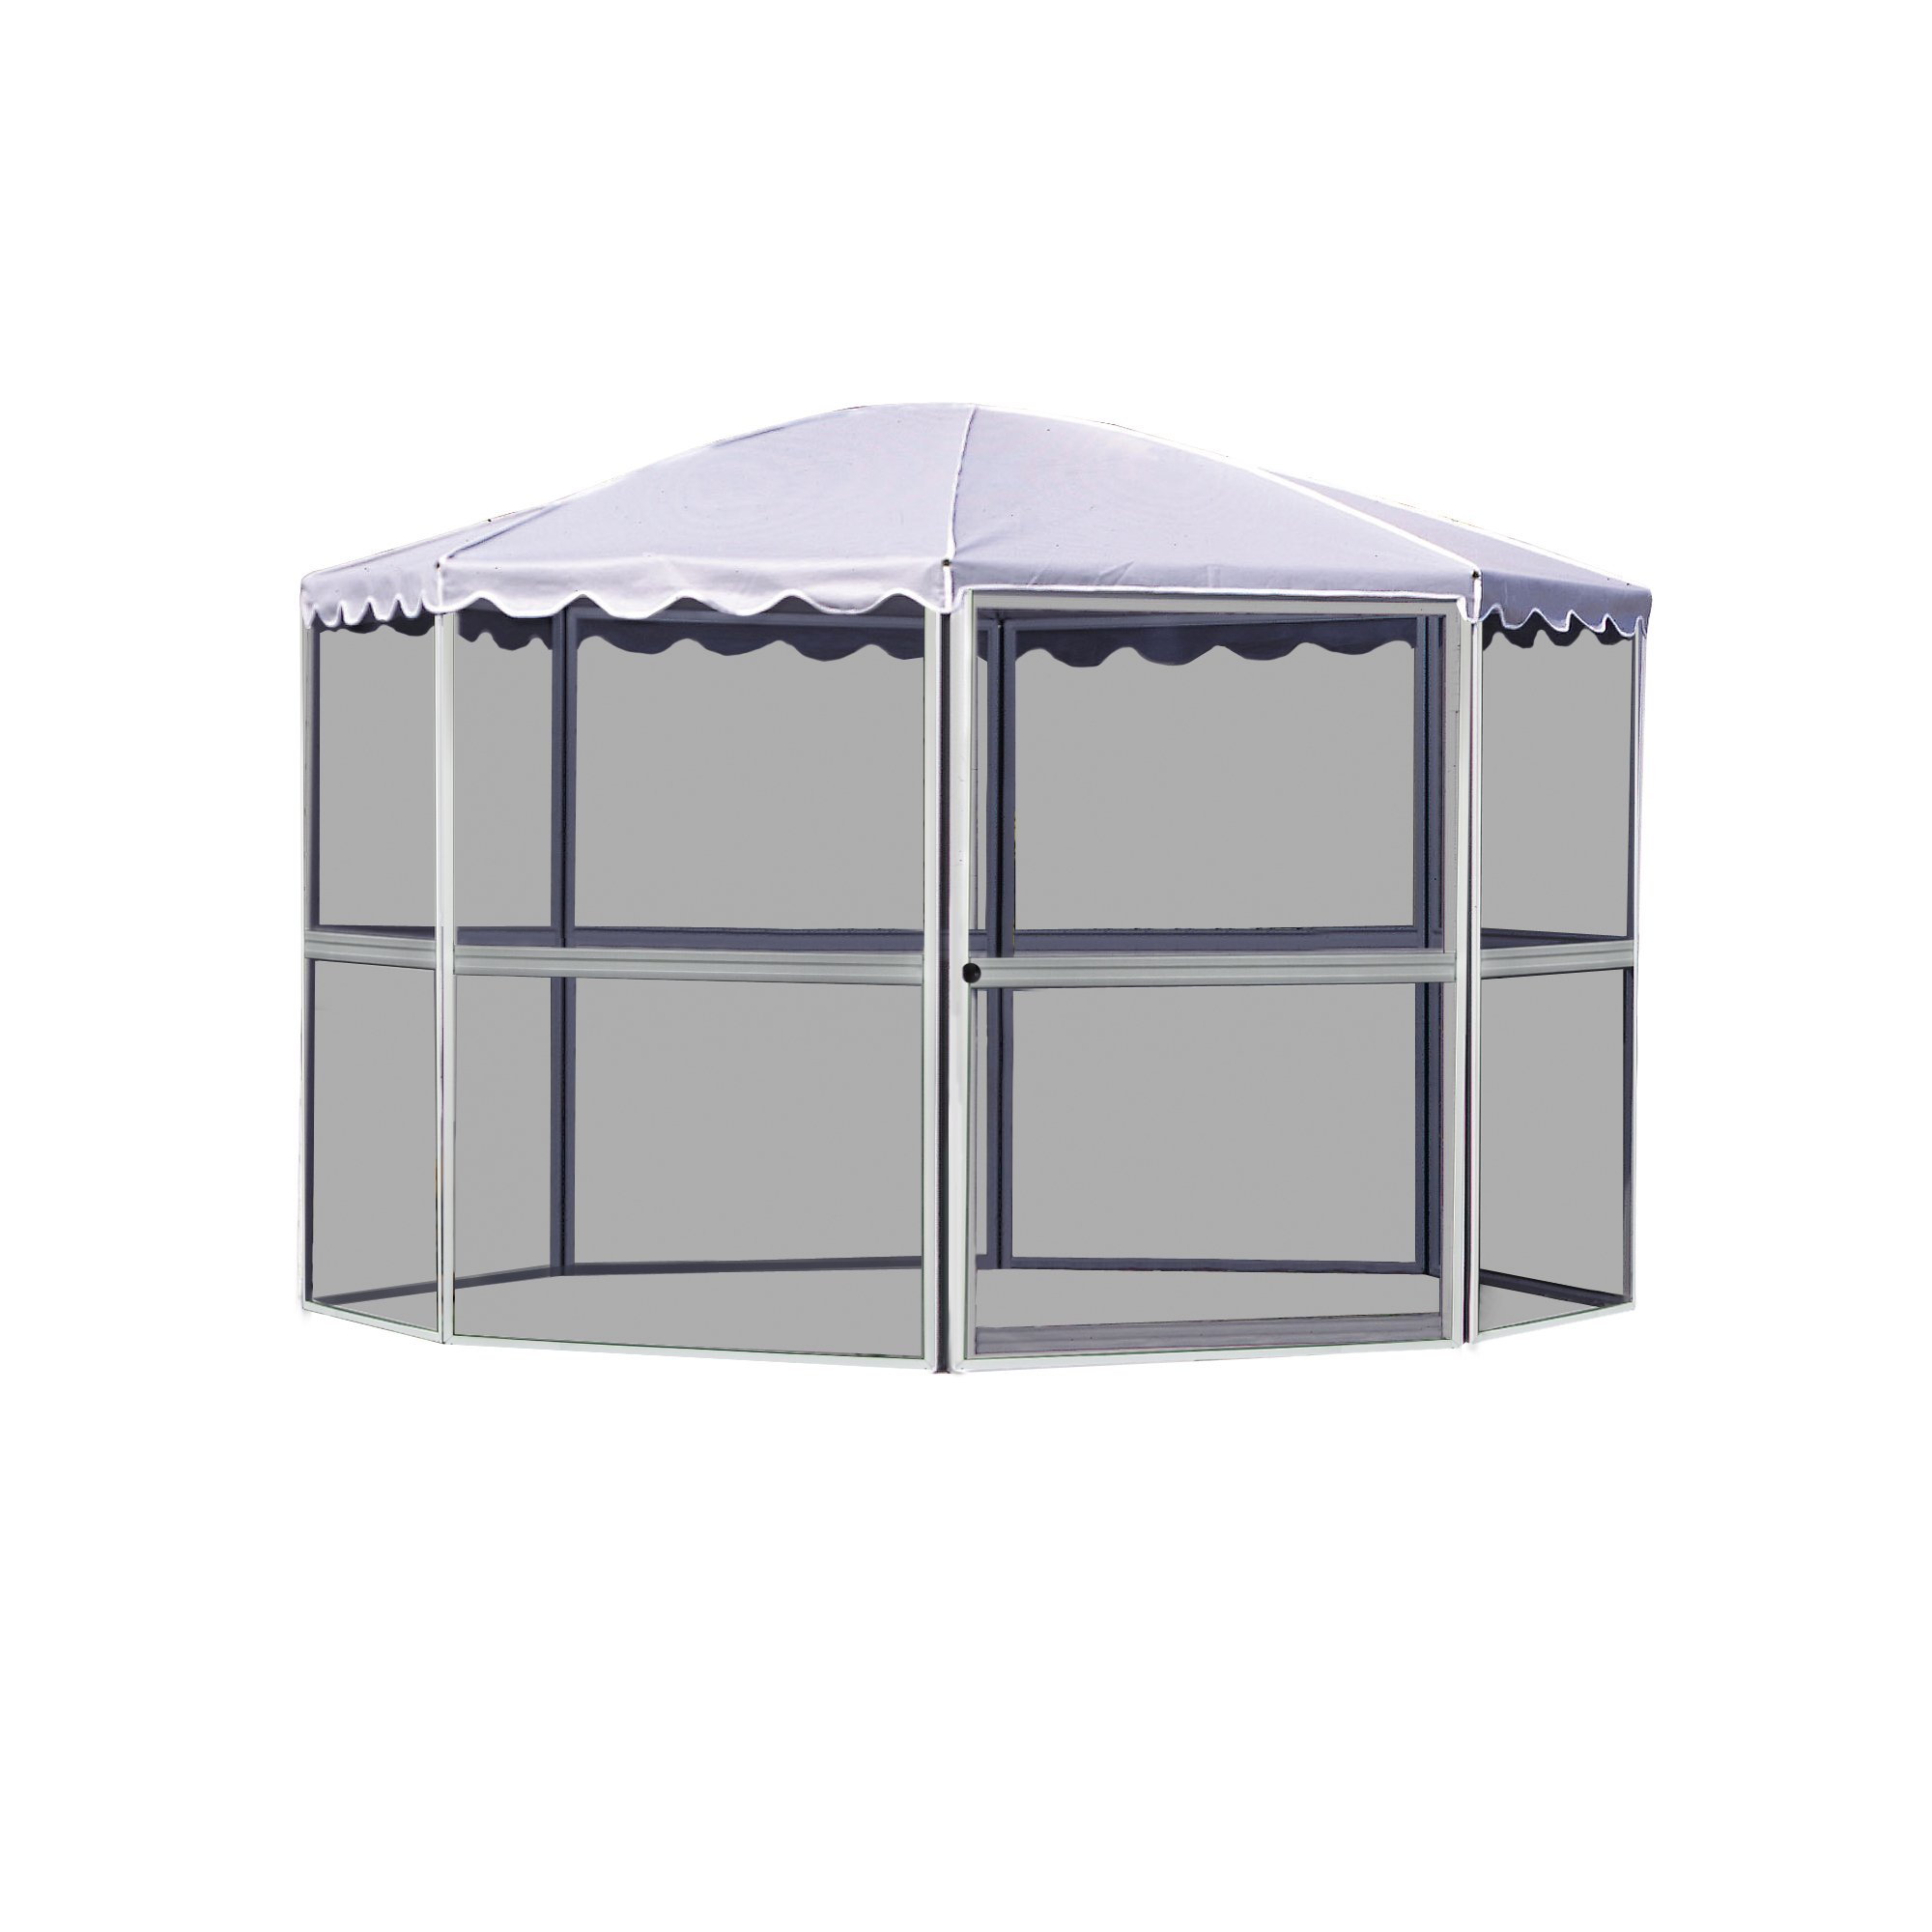 Casita 8-Panel Round Screenhouse 83222, White with Gray Roof by Casita